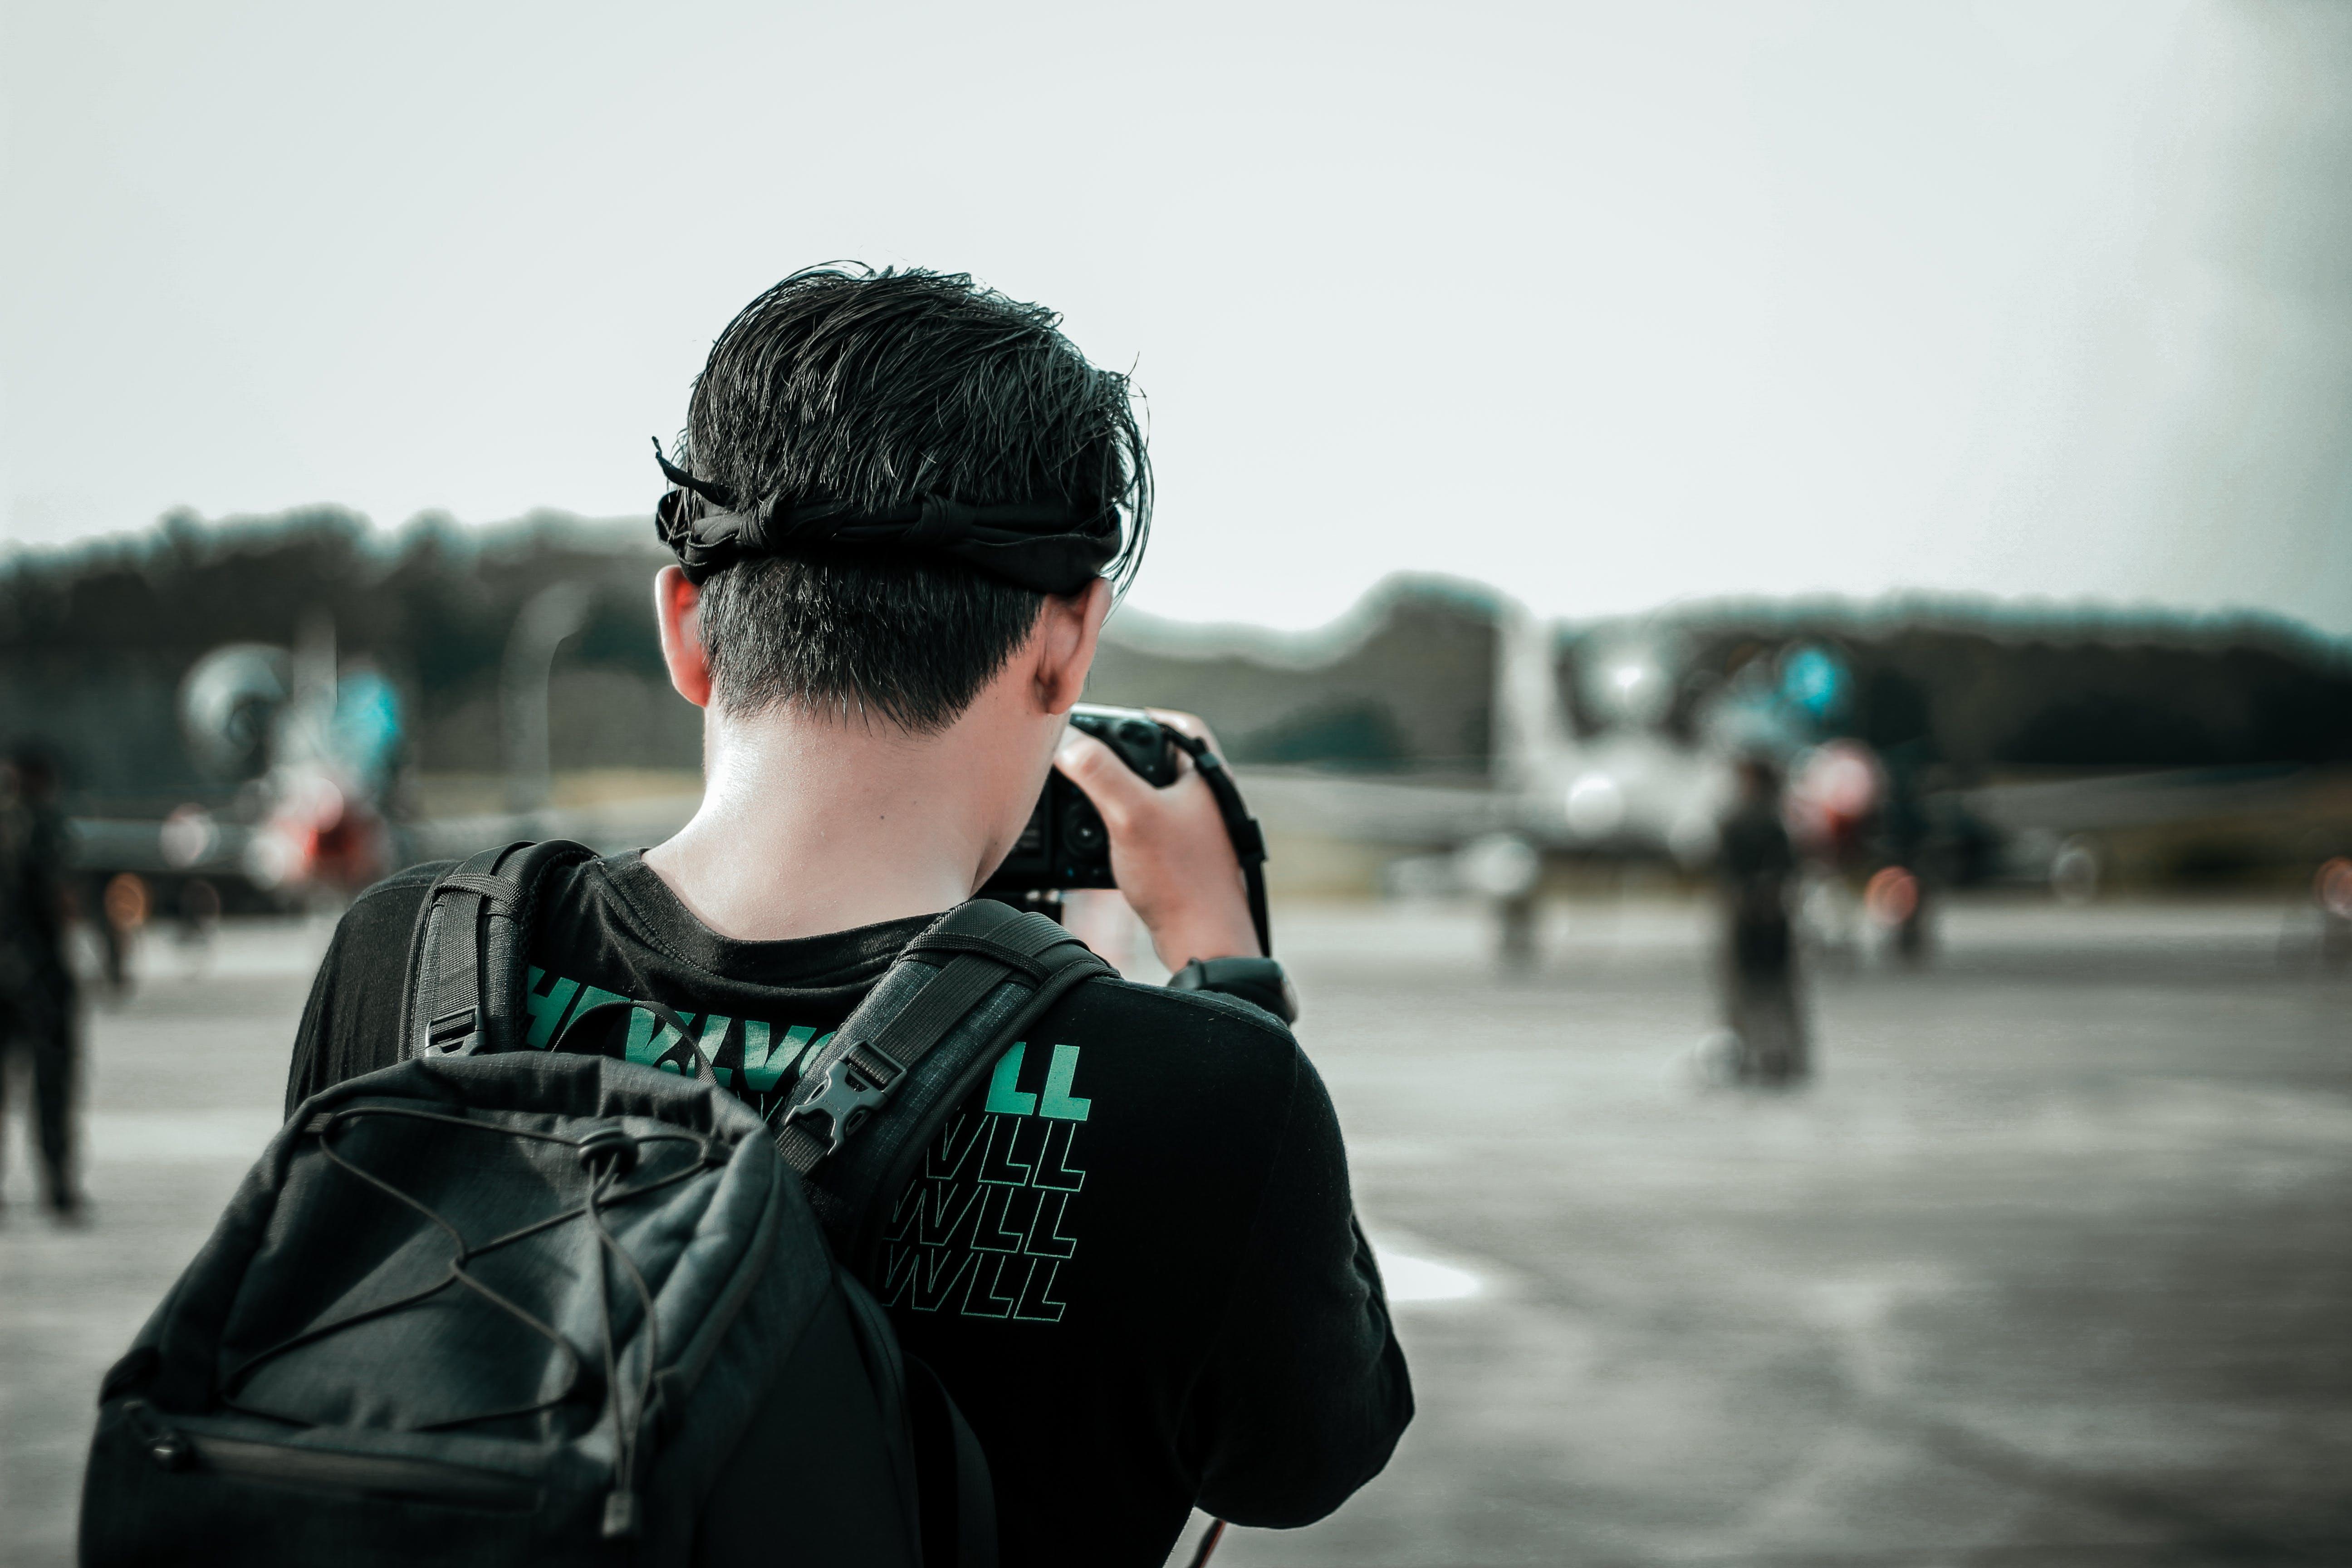 fotograf, journalist, luftslør